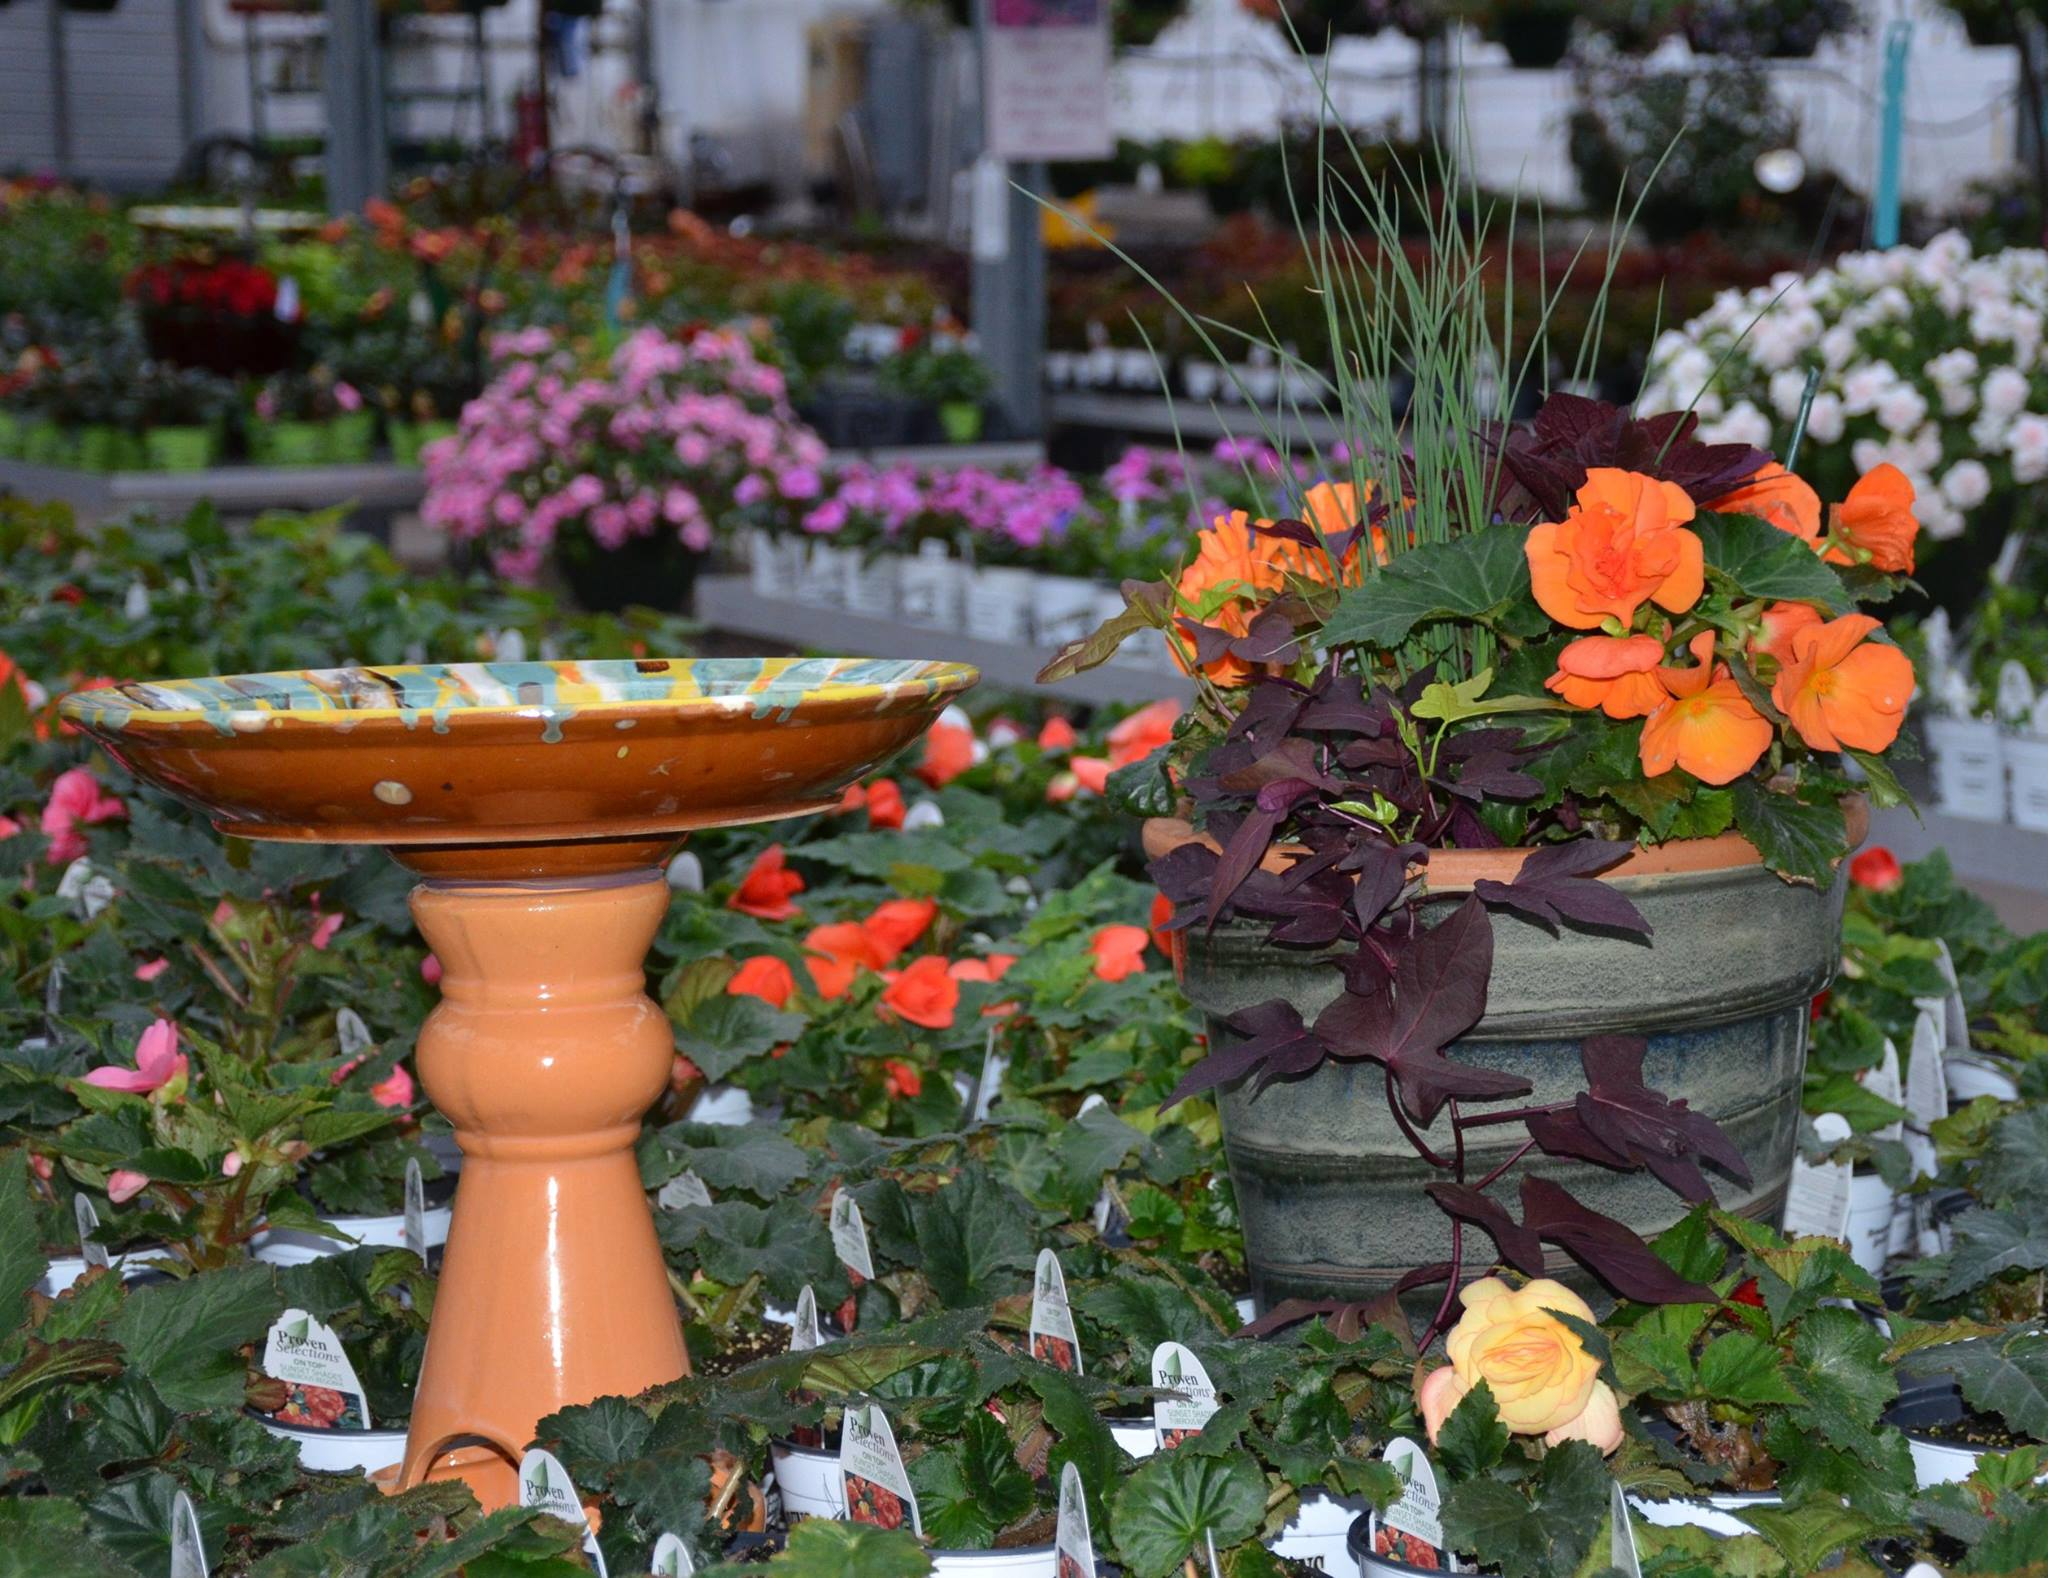 Greenhouse Plants and Bird Bath